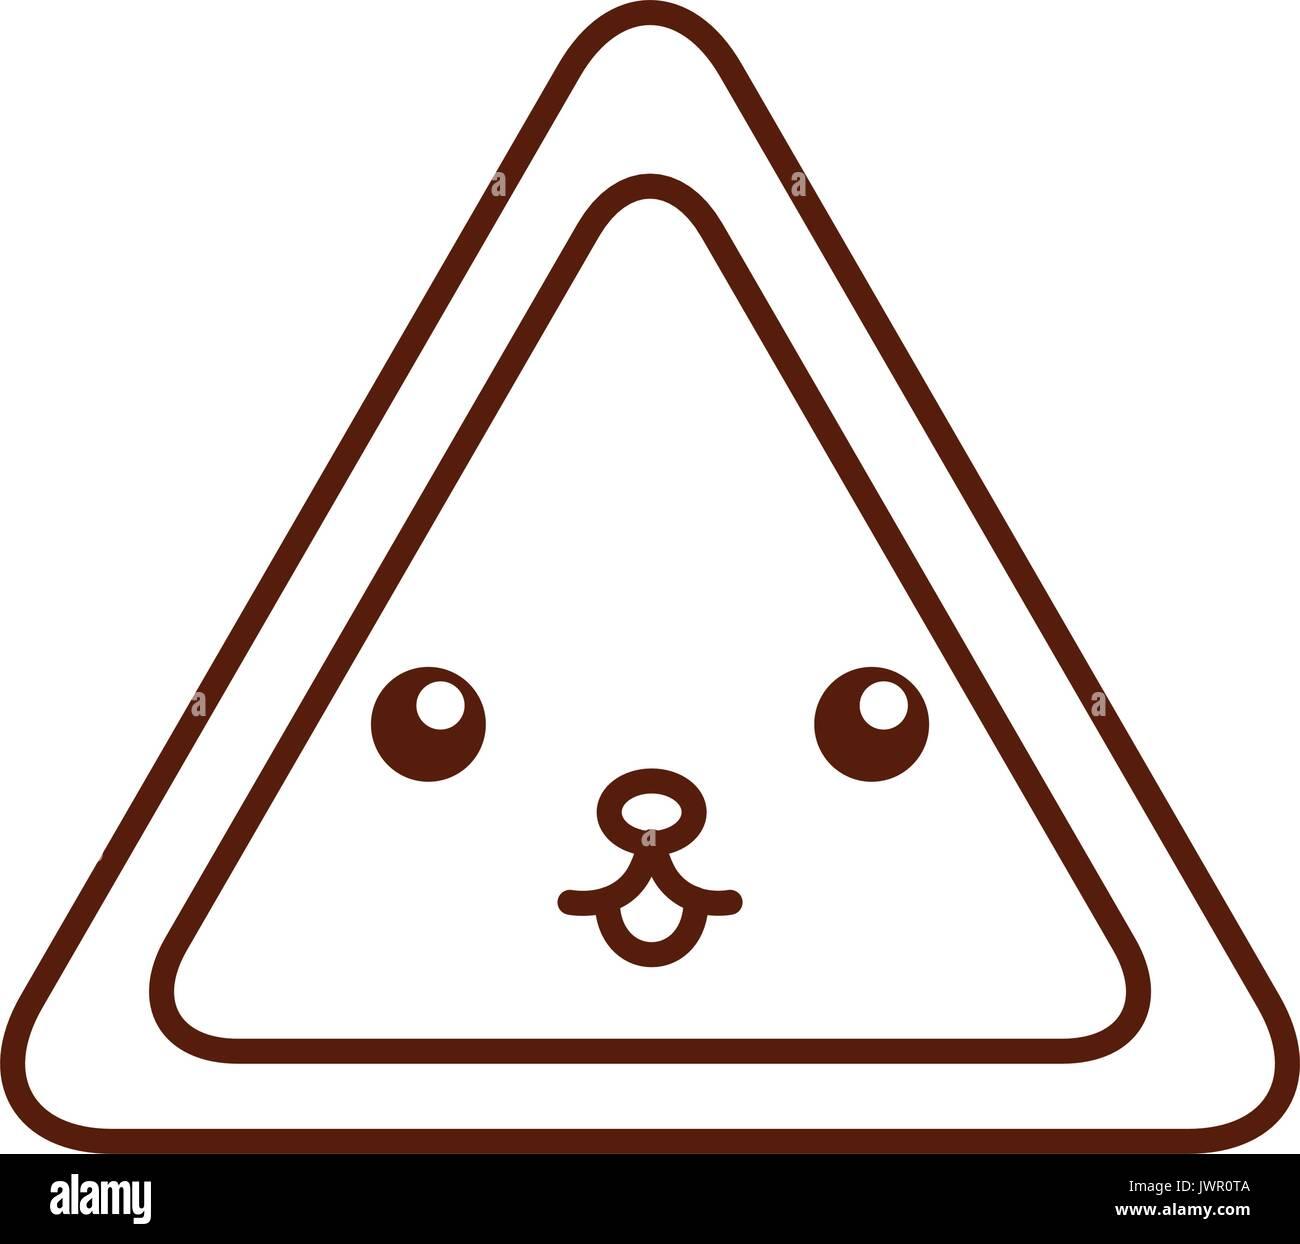 triangle signal kawaii character - Stock Image